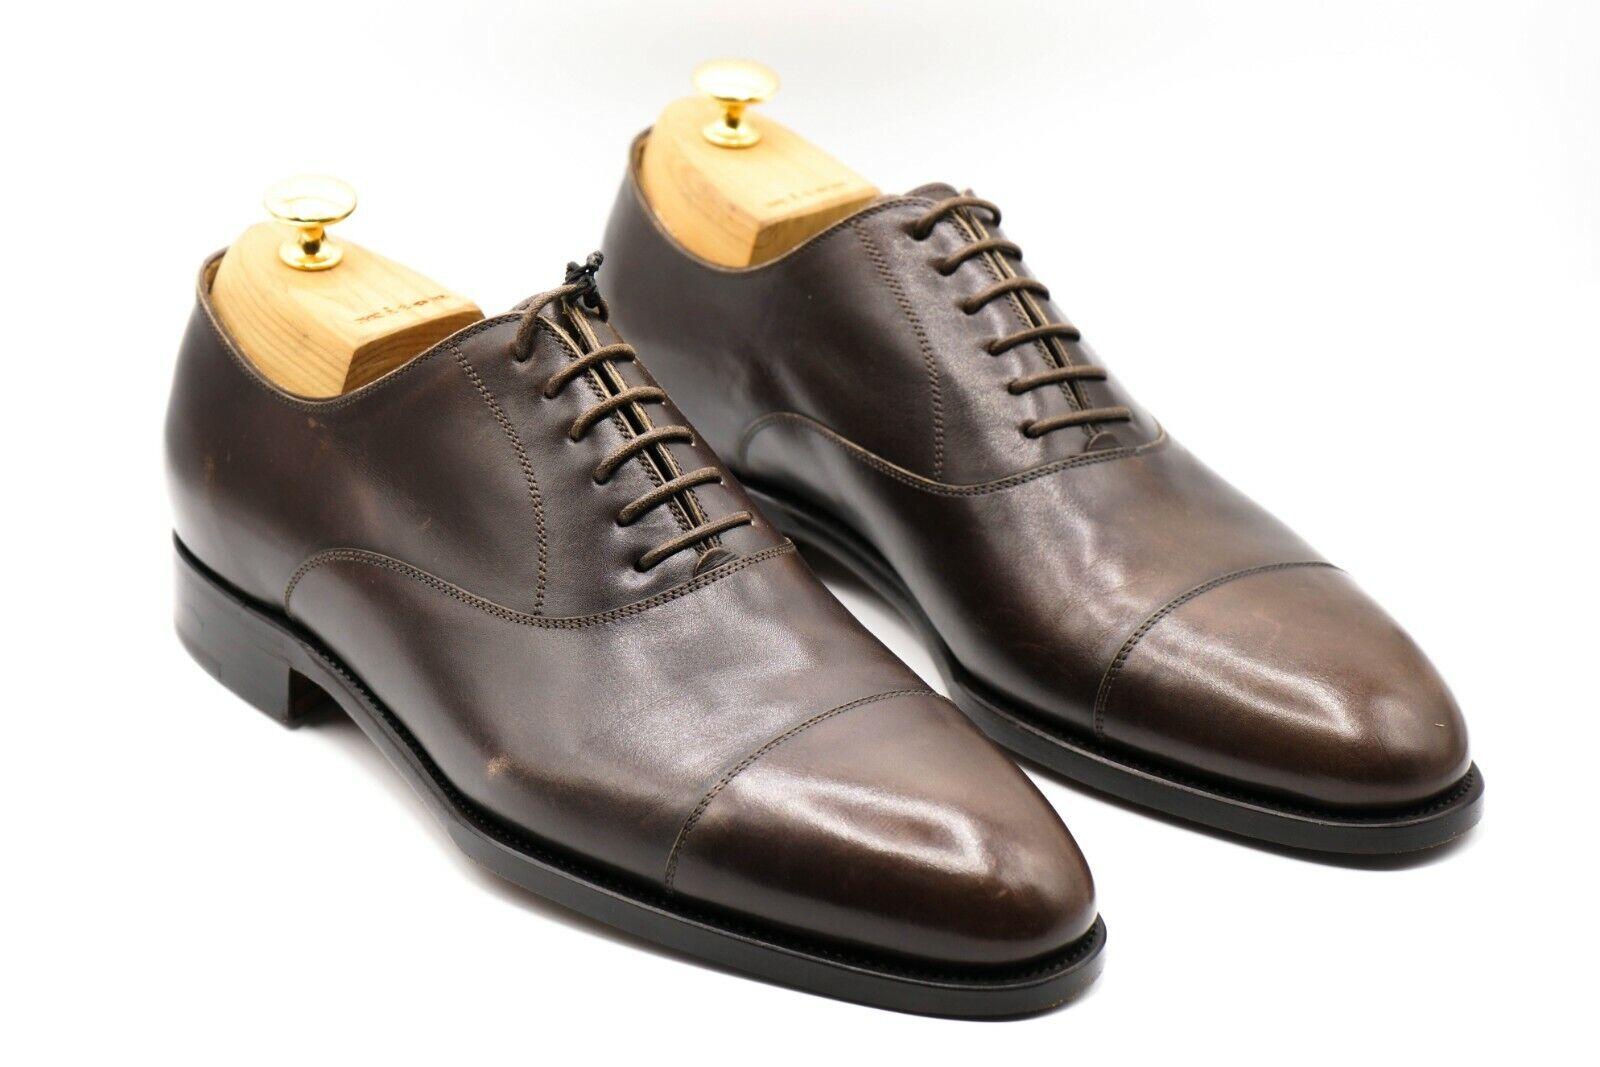 NEW KITON Napoli Dress Leather Shoes Size Eu 43 Uk 9 Us 10 (KIS42)